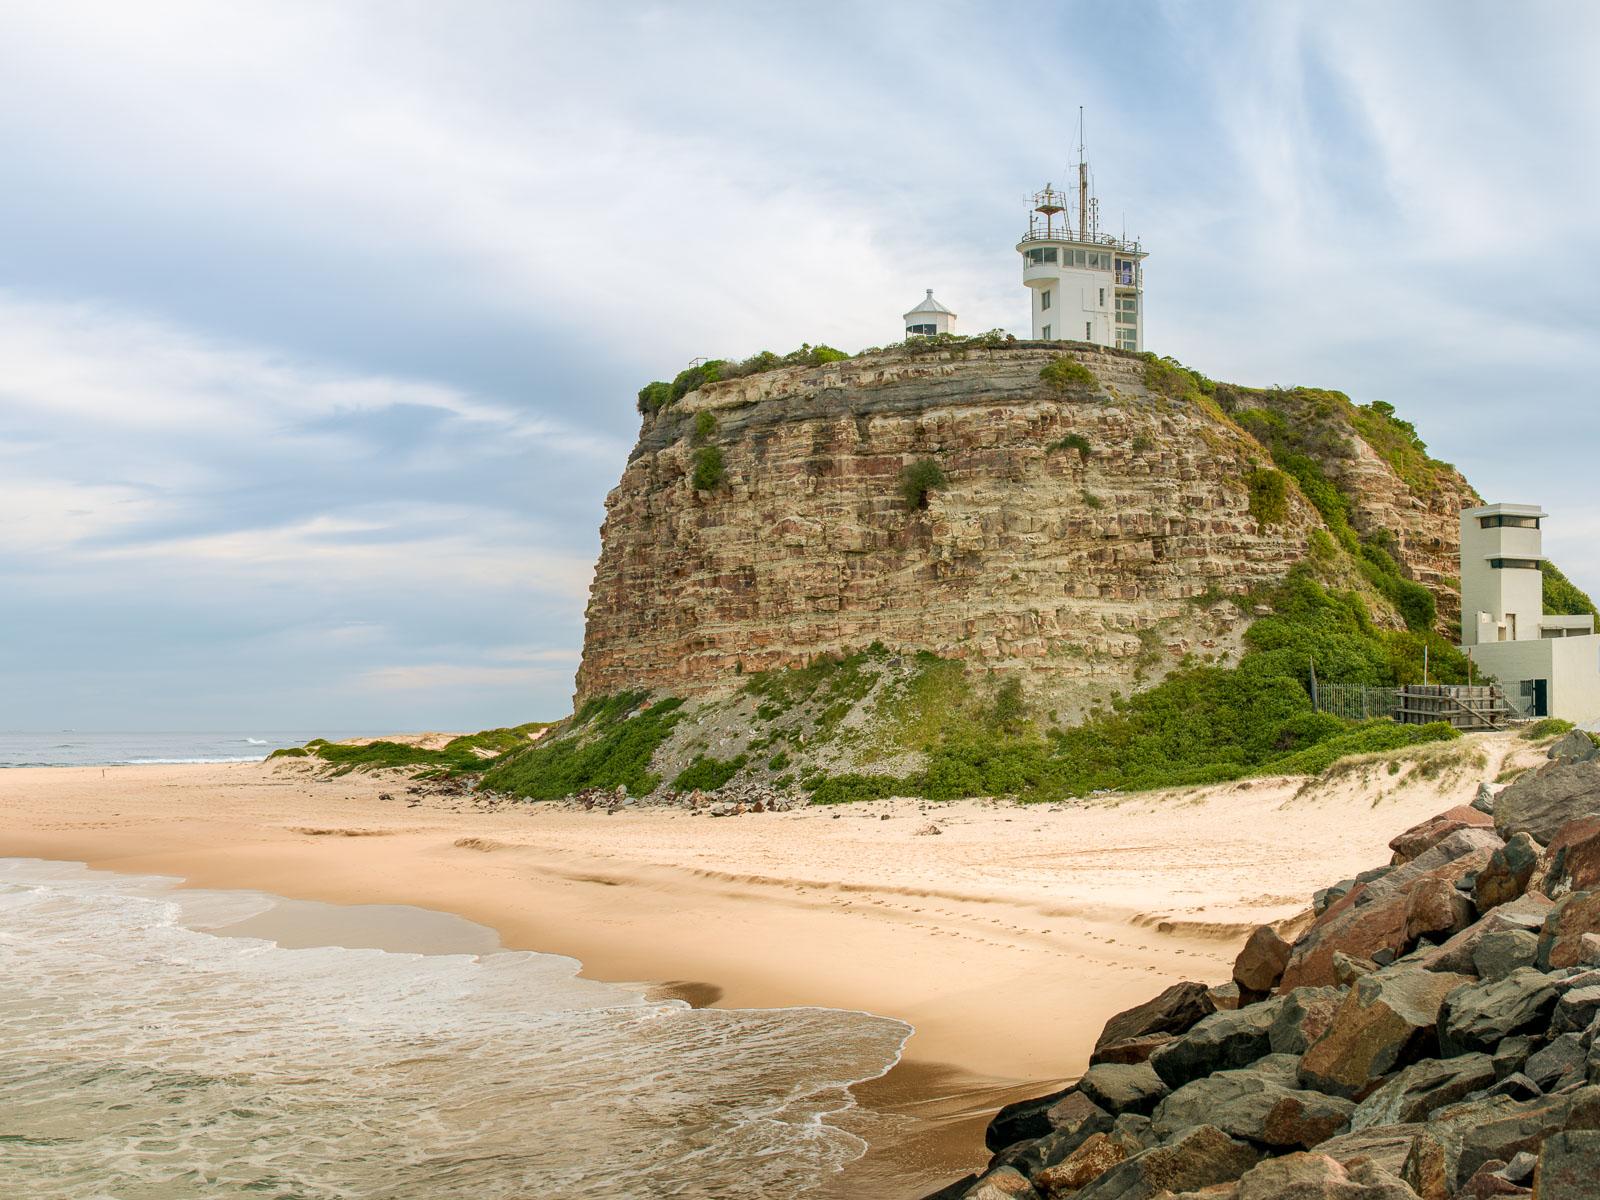 Nobby's Lighthouse